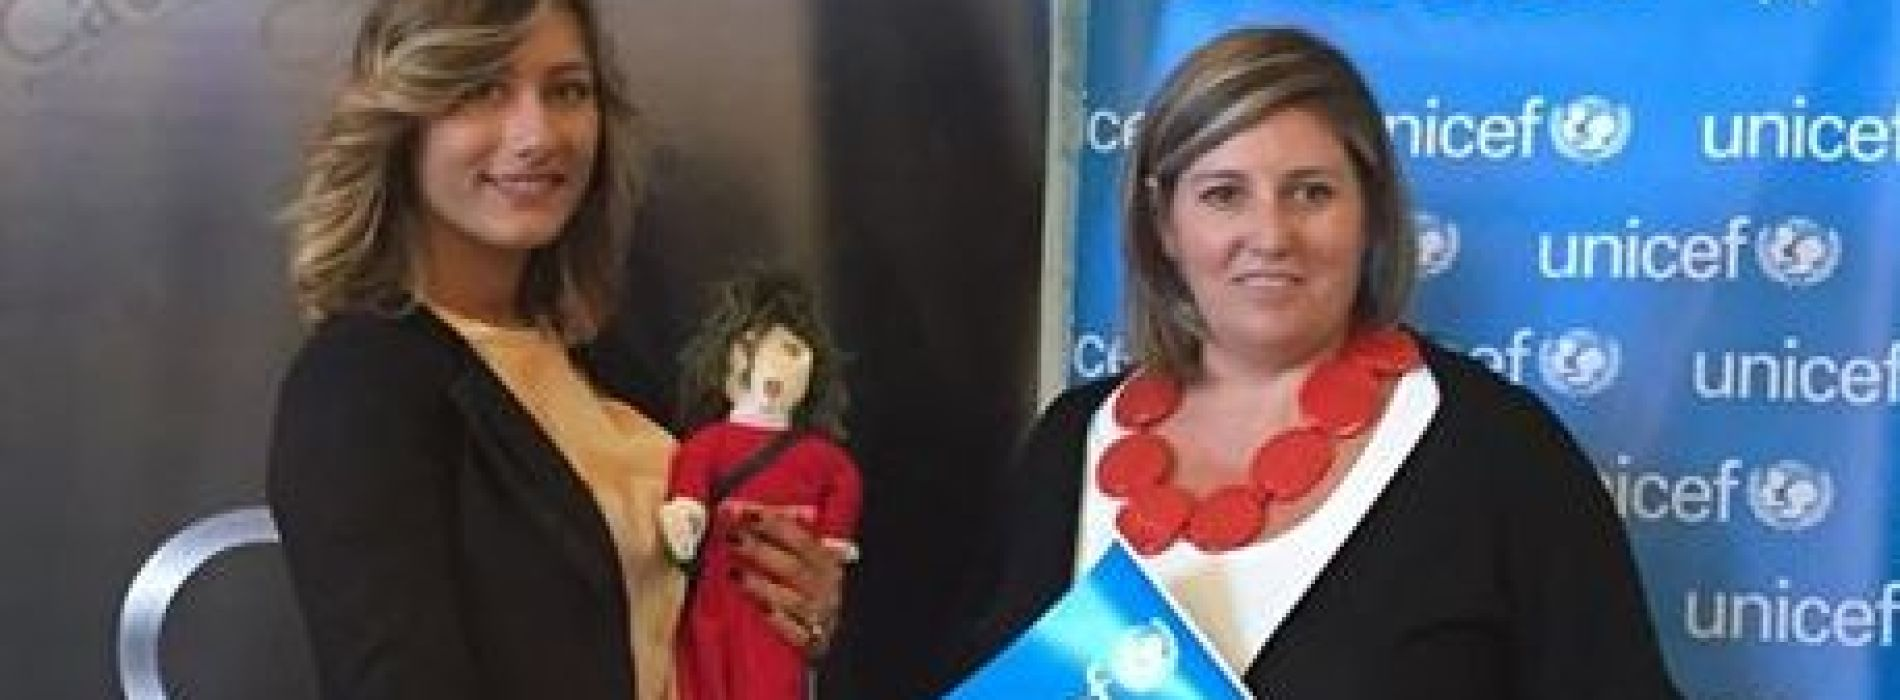 "Un week end con le ""rosse"" per sostenere l'Unicef"